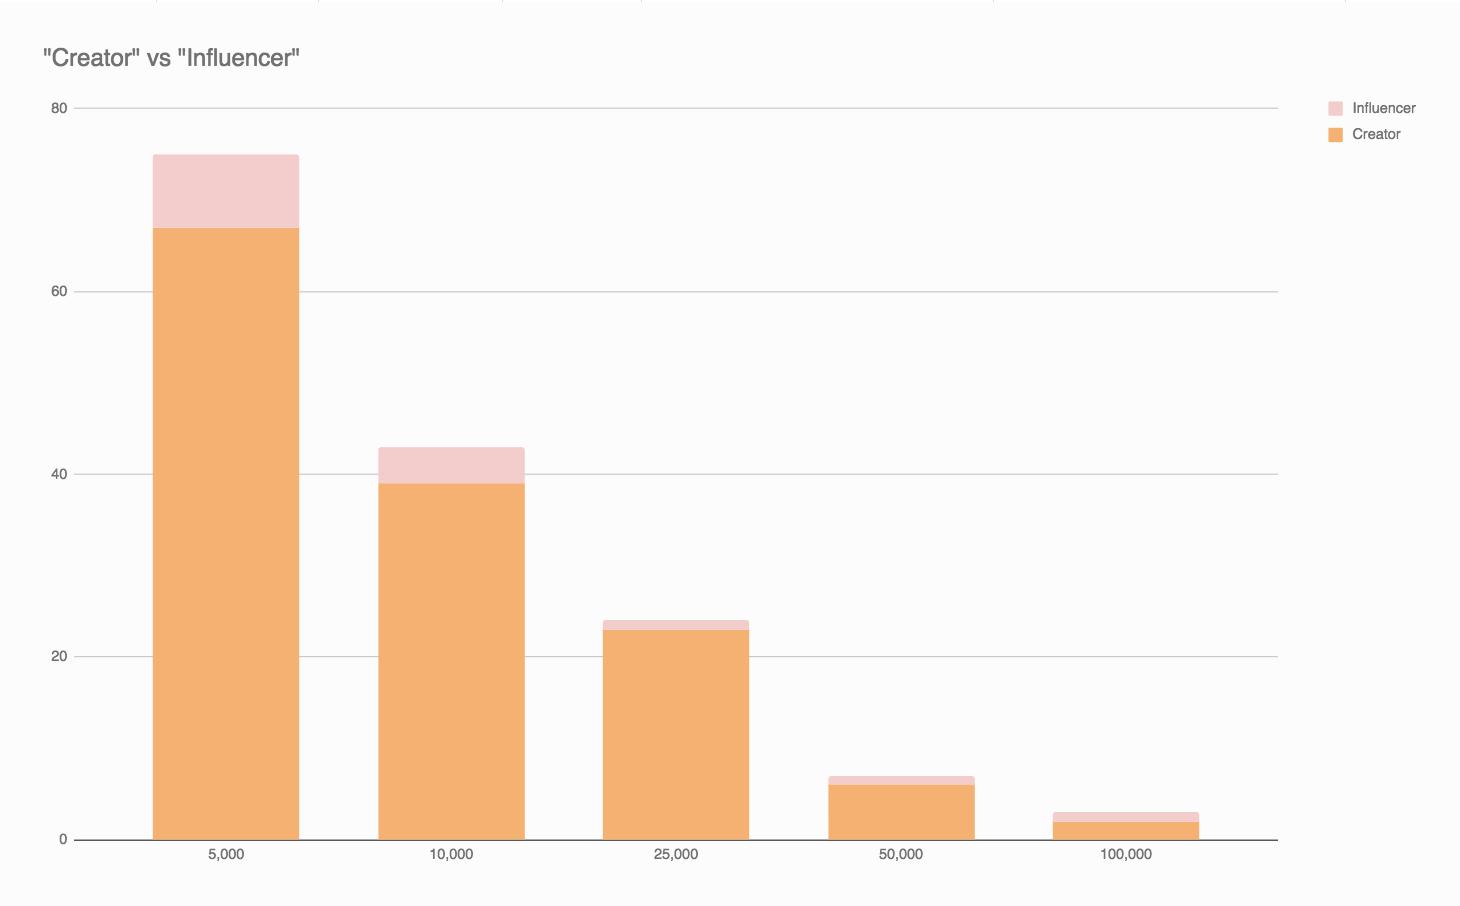 influencer-news-data-creators.png